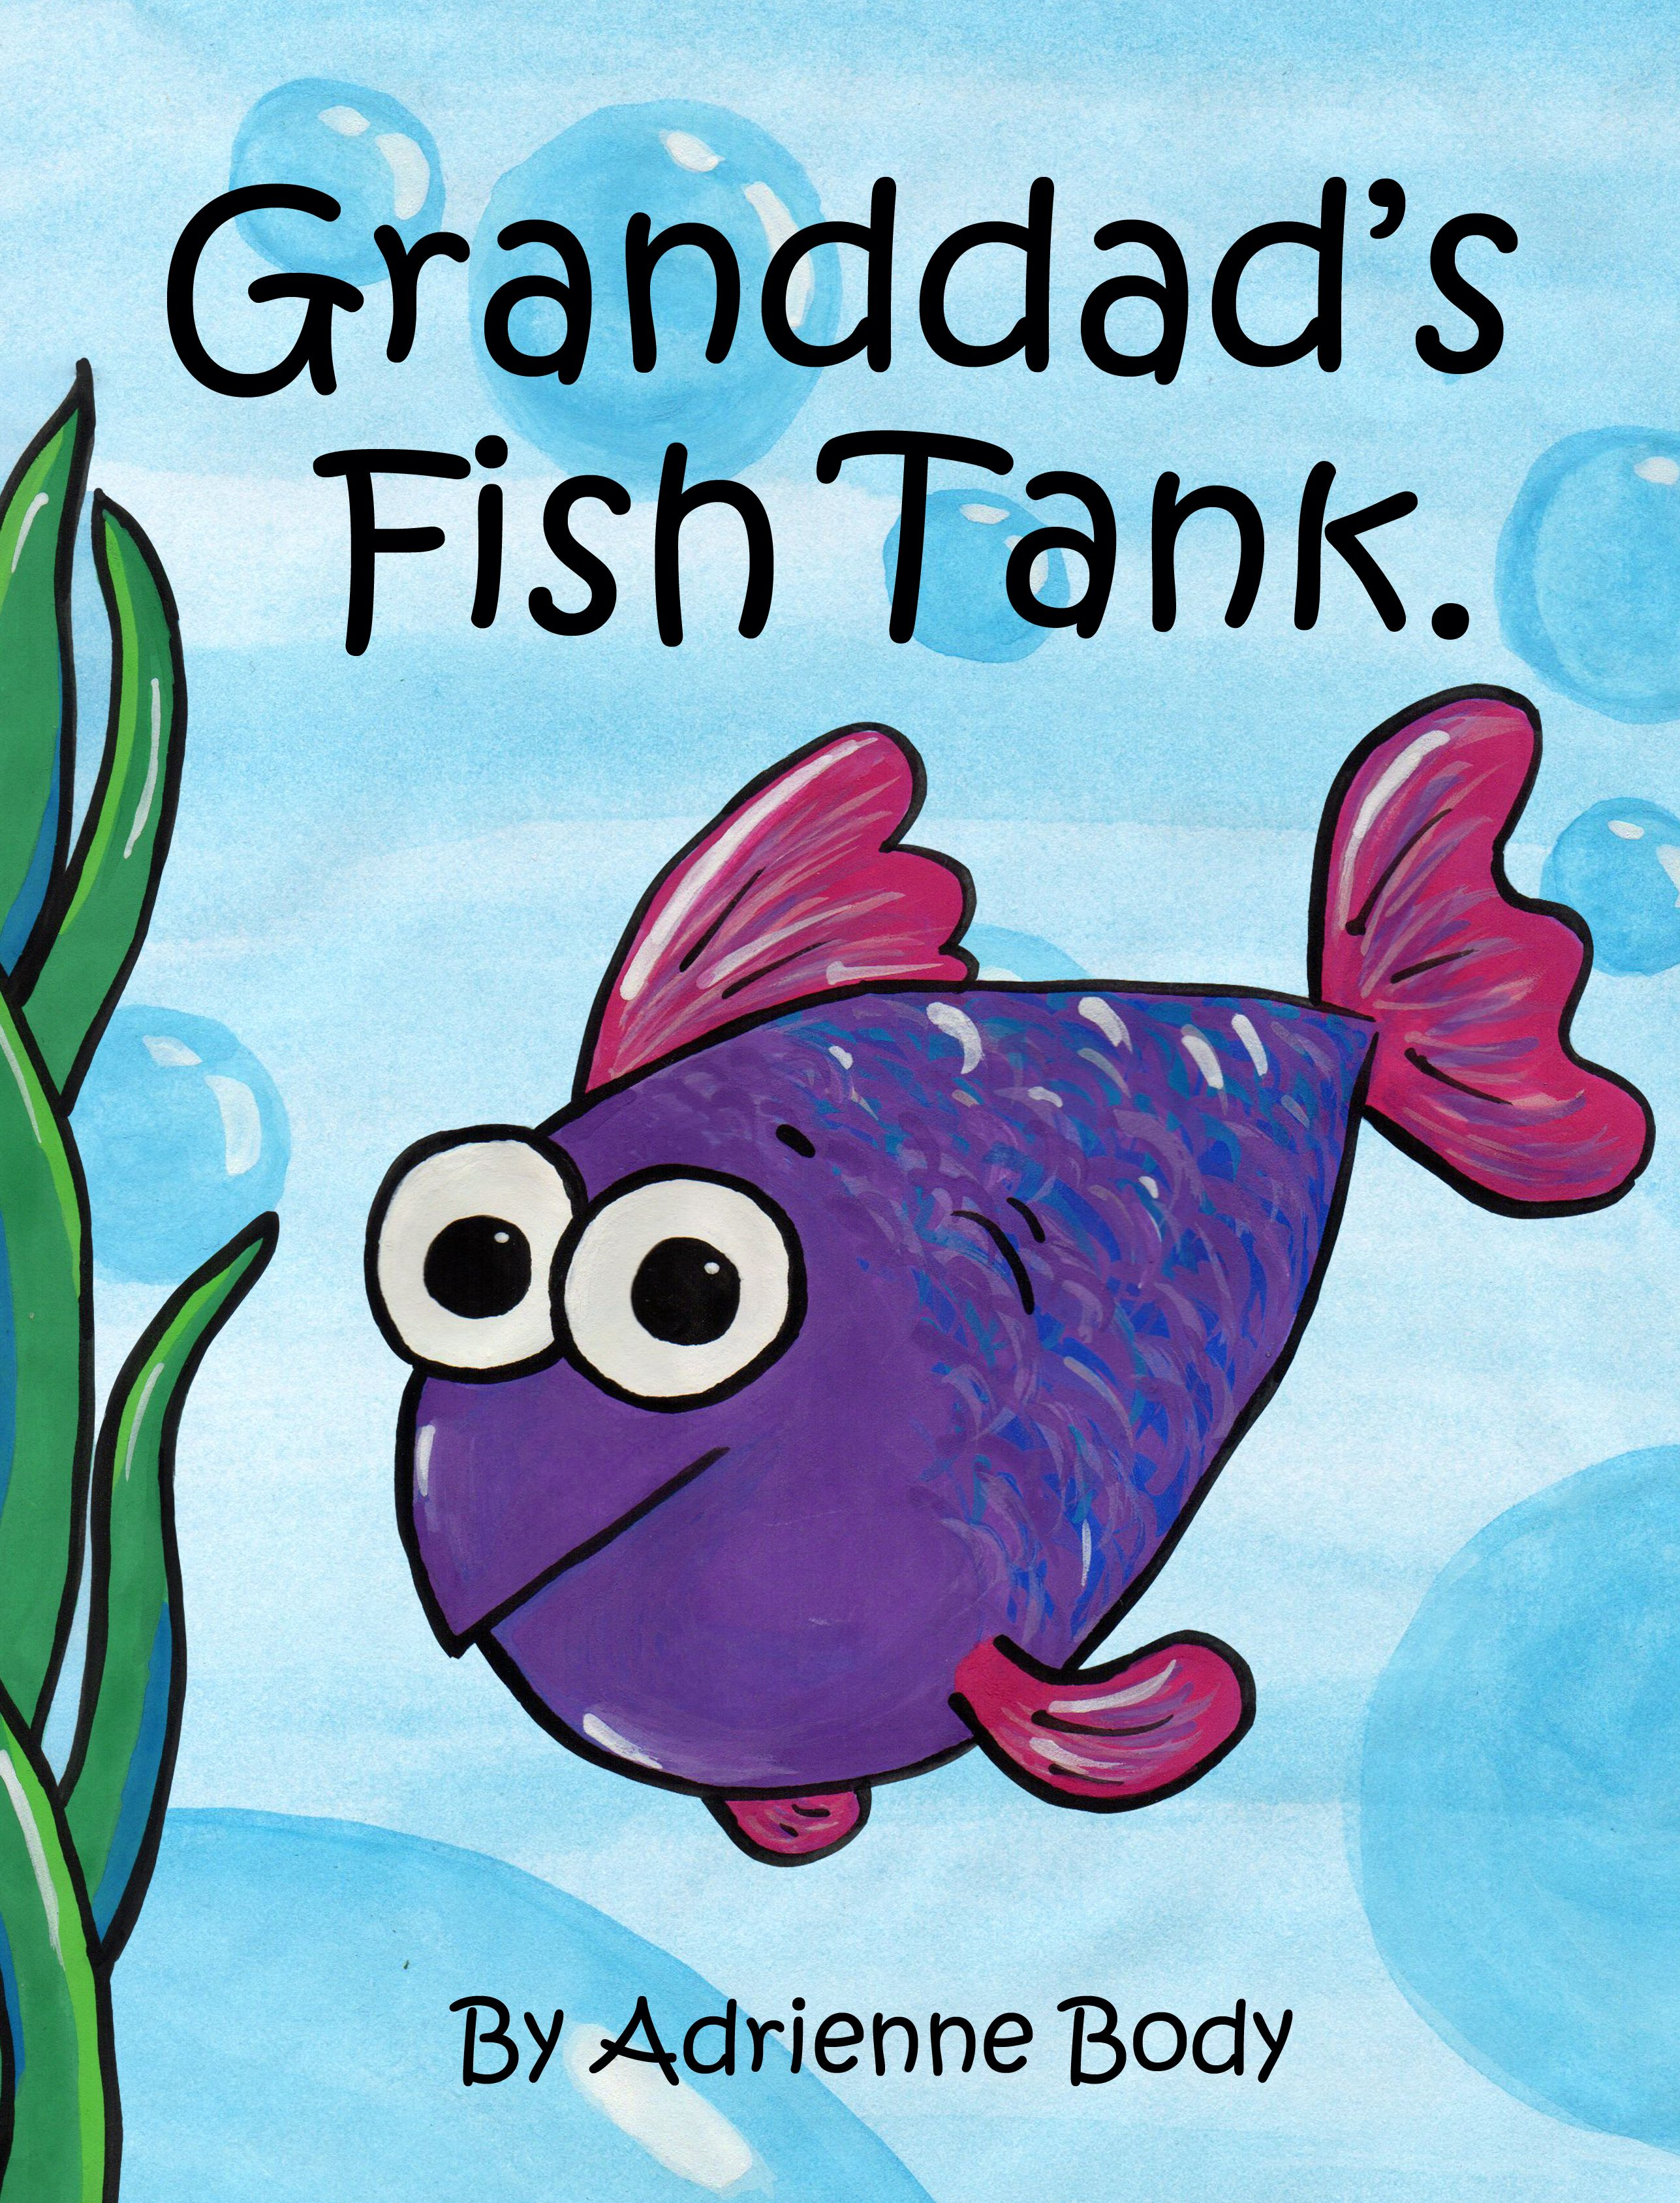 Granddad 39 s fish tank children 39 s book about aquarium fish for Children s books about fish